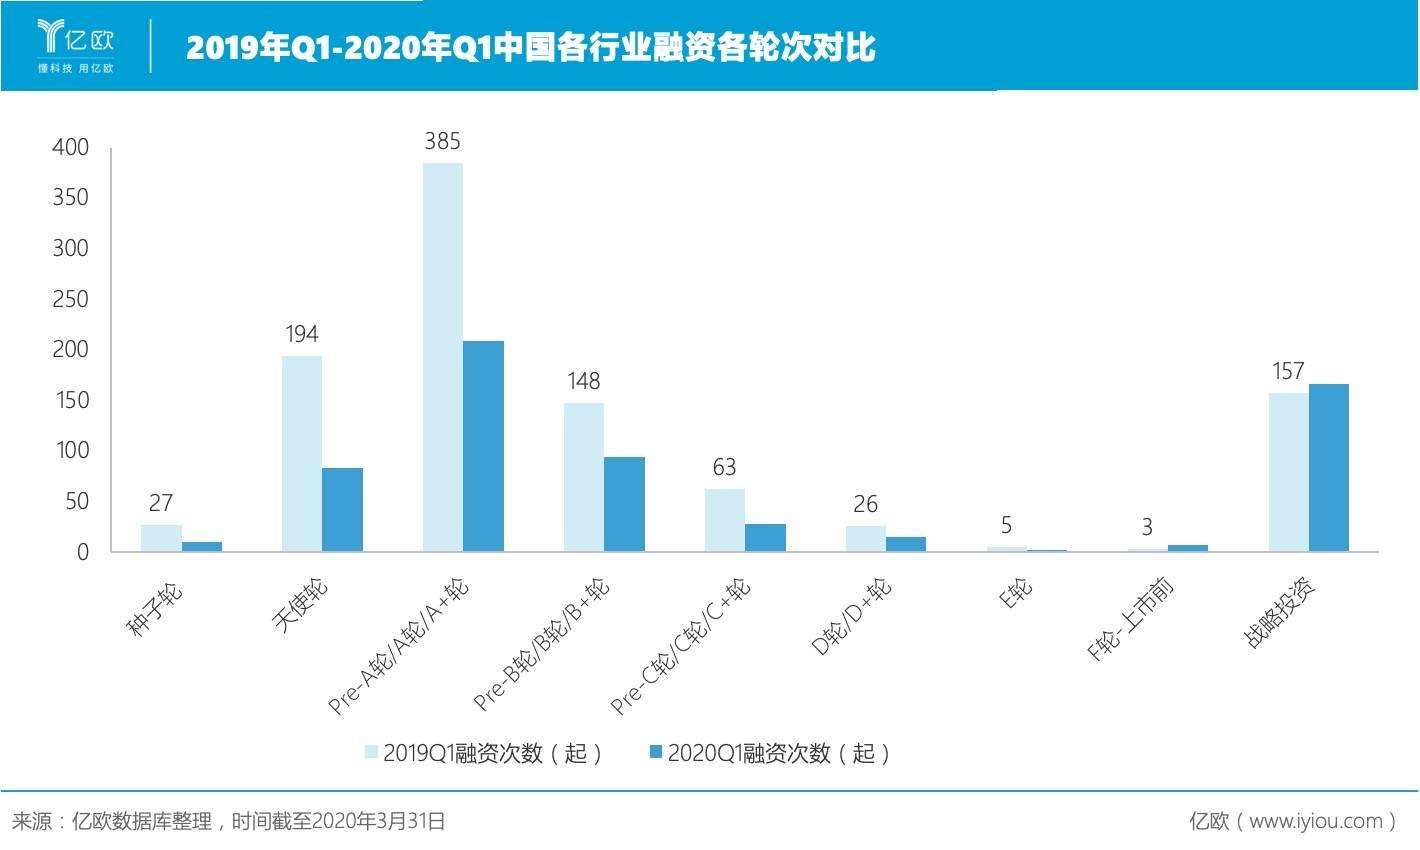 2019年Q1-2020年Q1中国各走业融资各轮次对比.jpeg